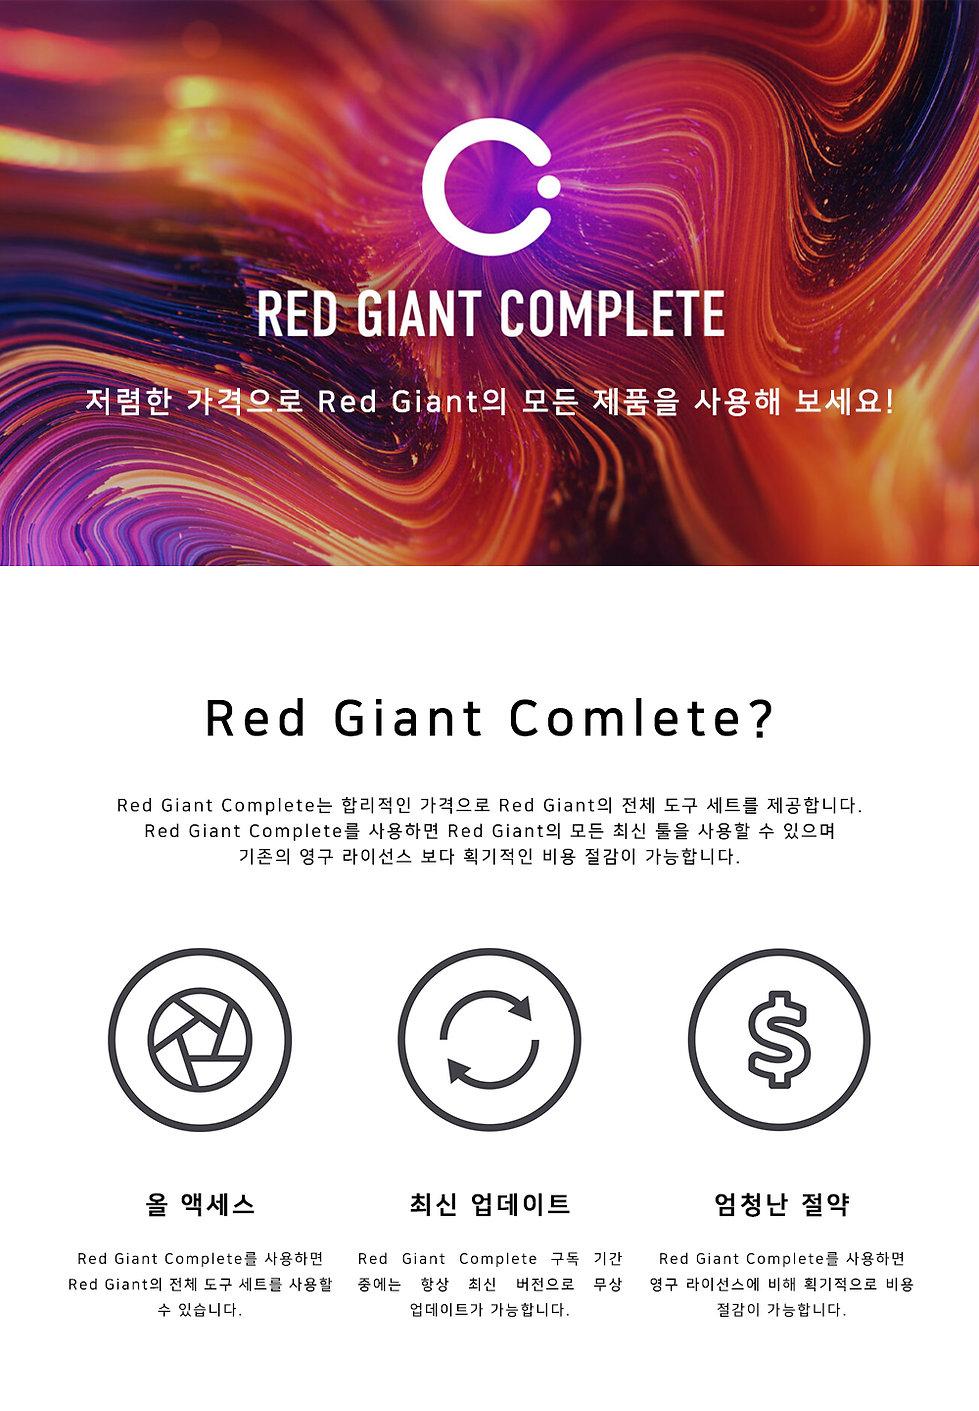 Red Giant copmlete_레드자이언트 컴플리트 장점.jpg